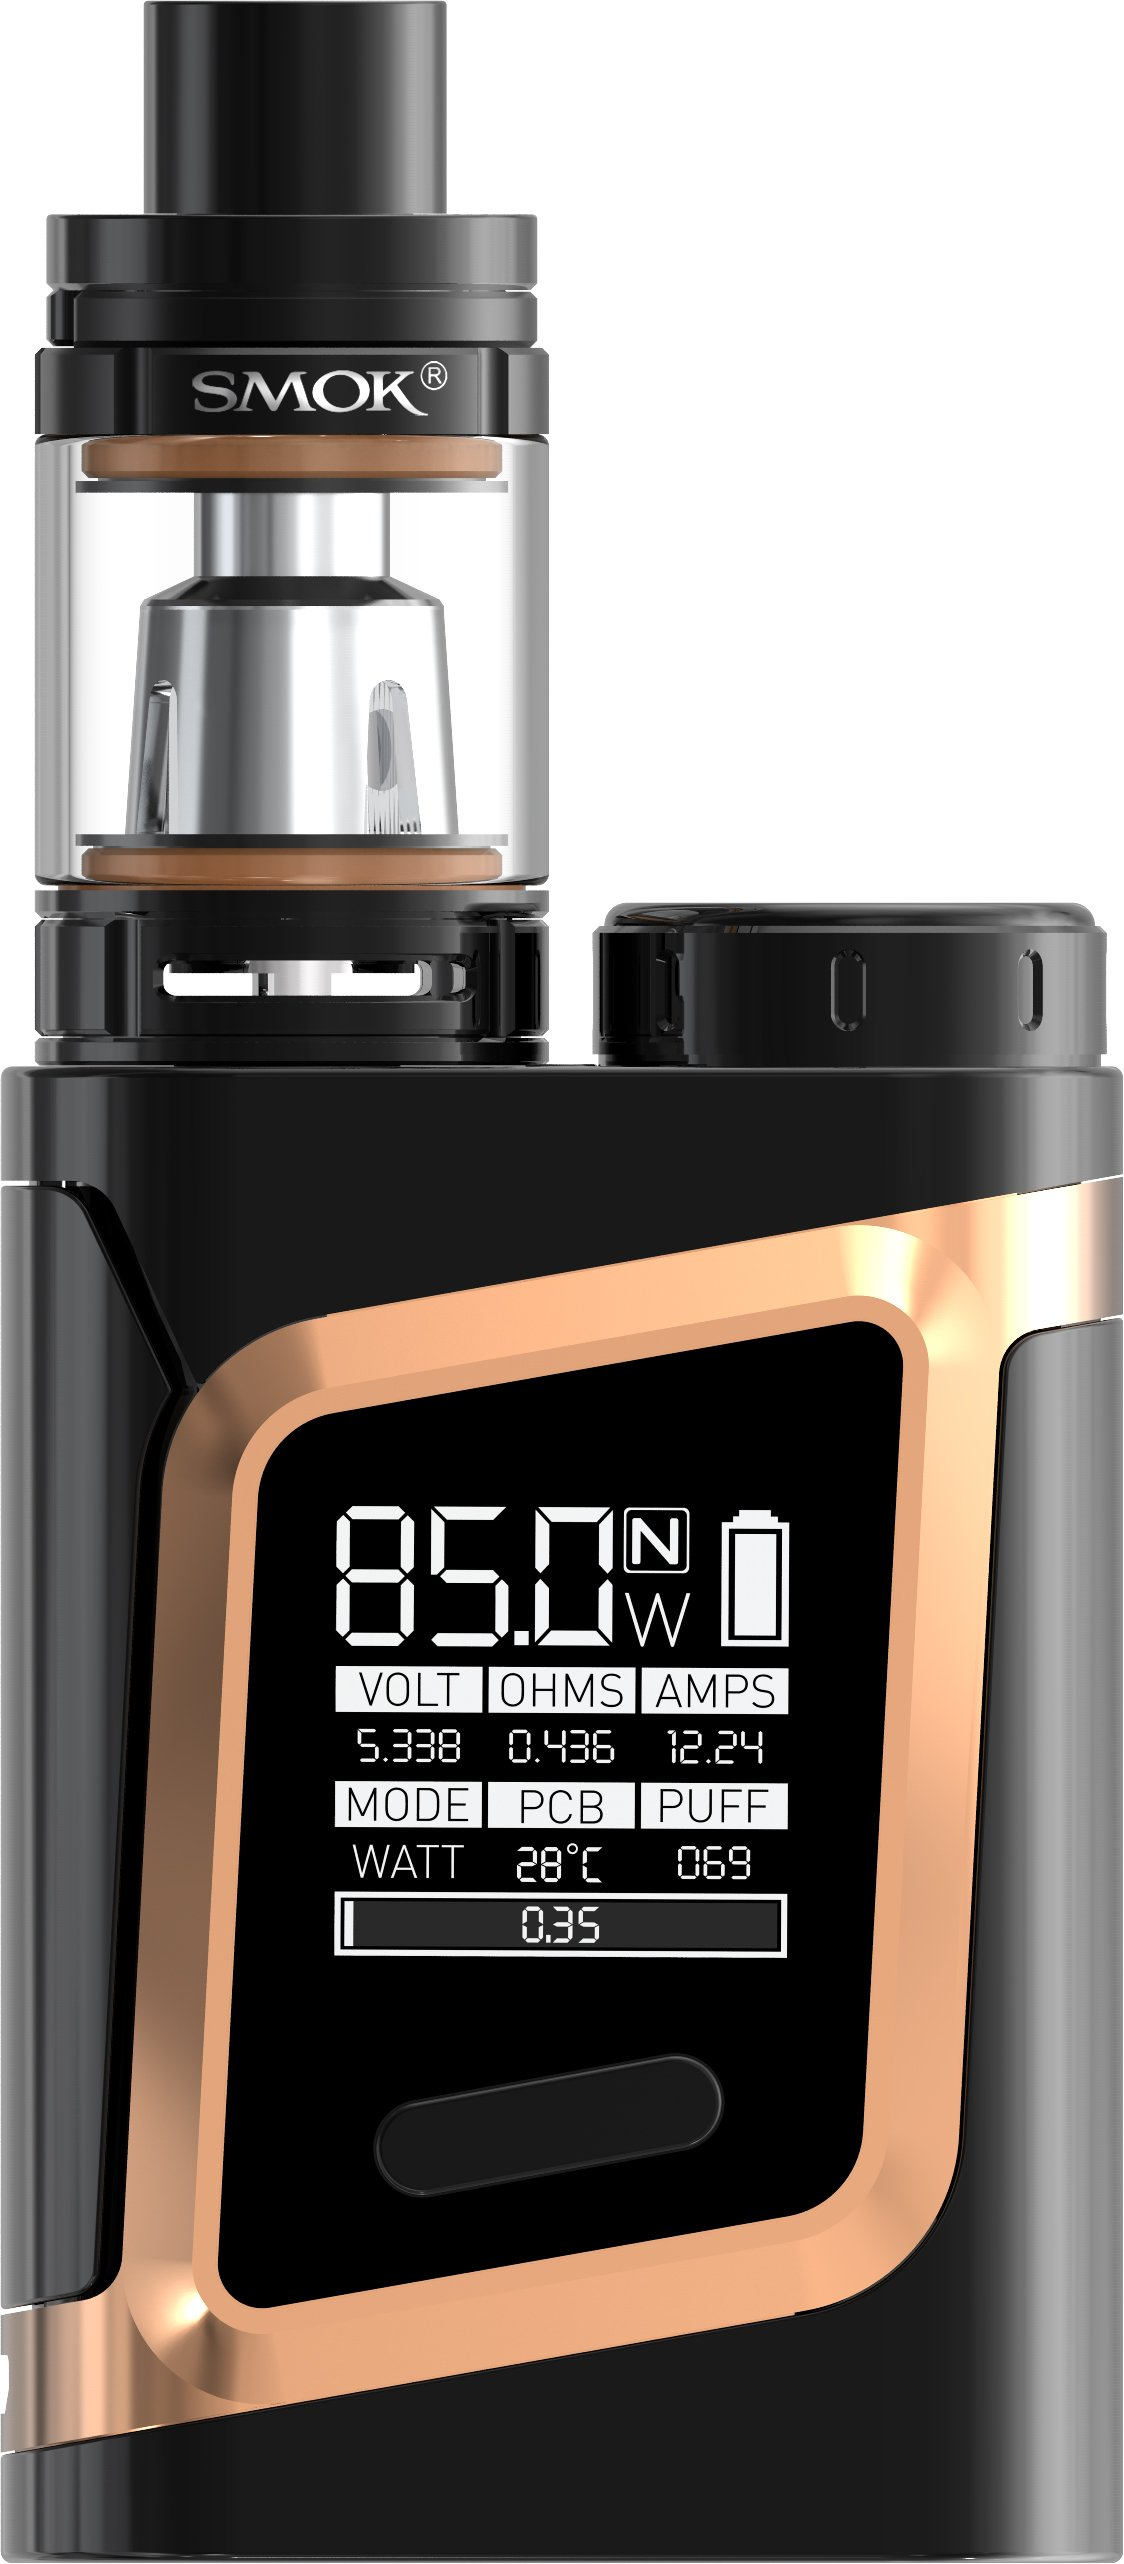 SMOK RHA85 Kit - Black Gold